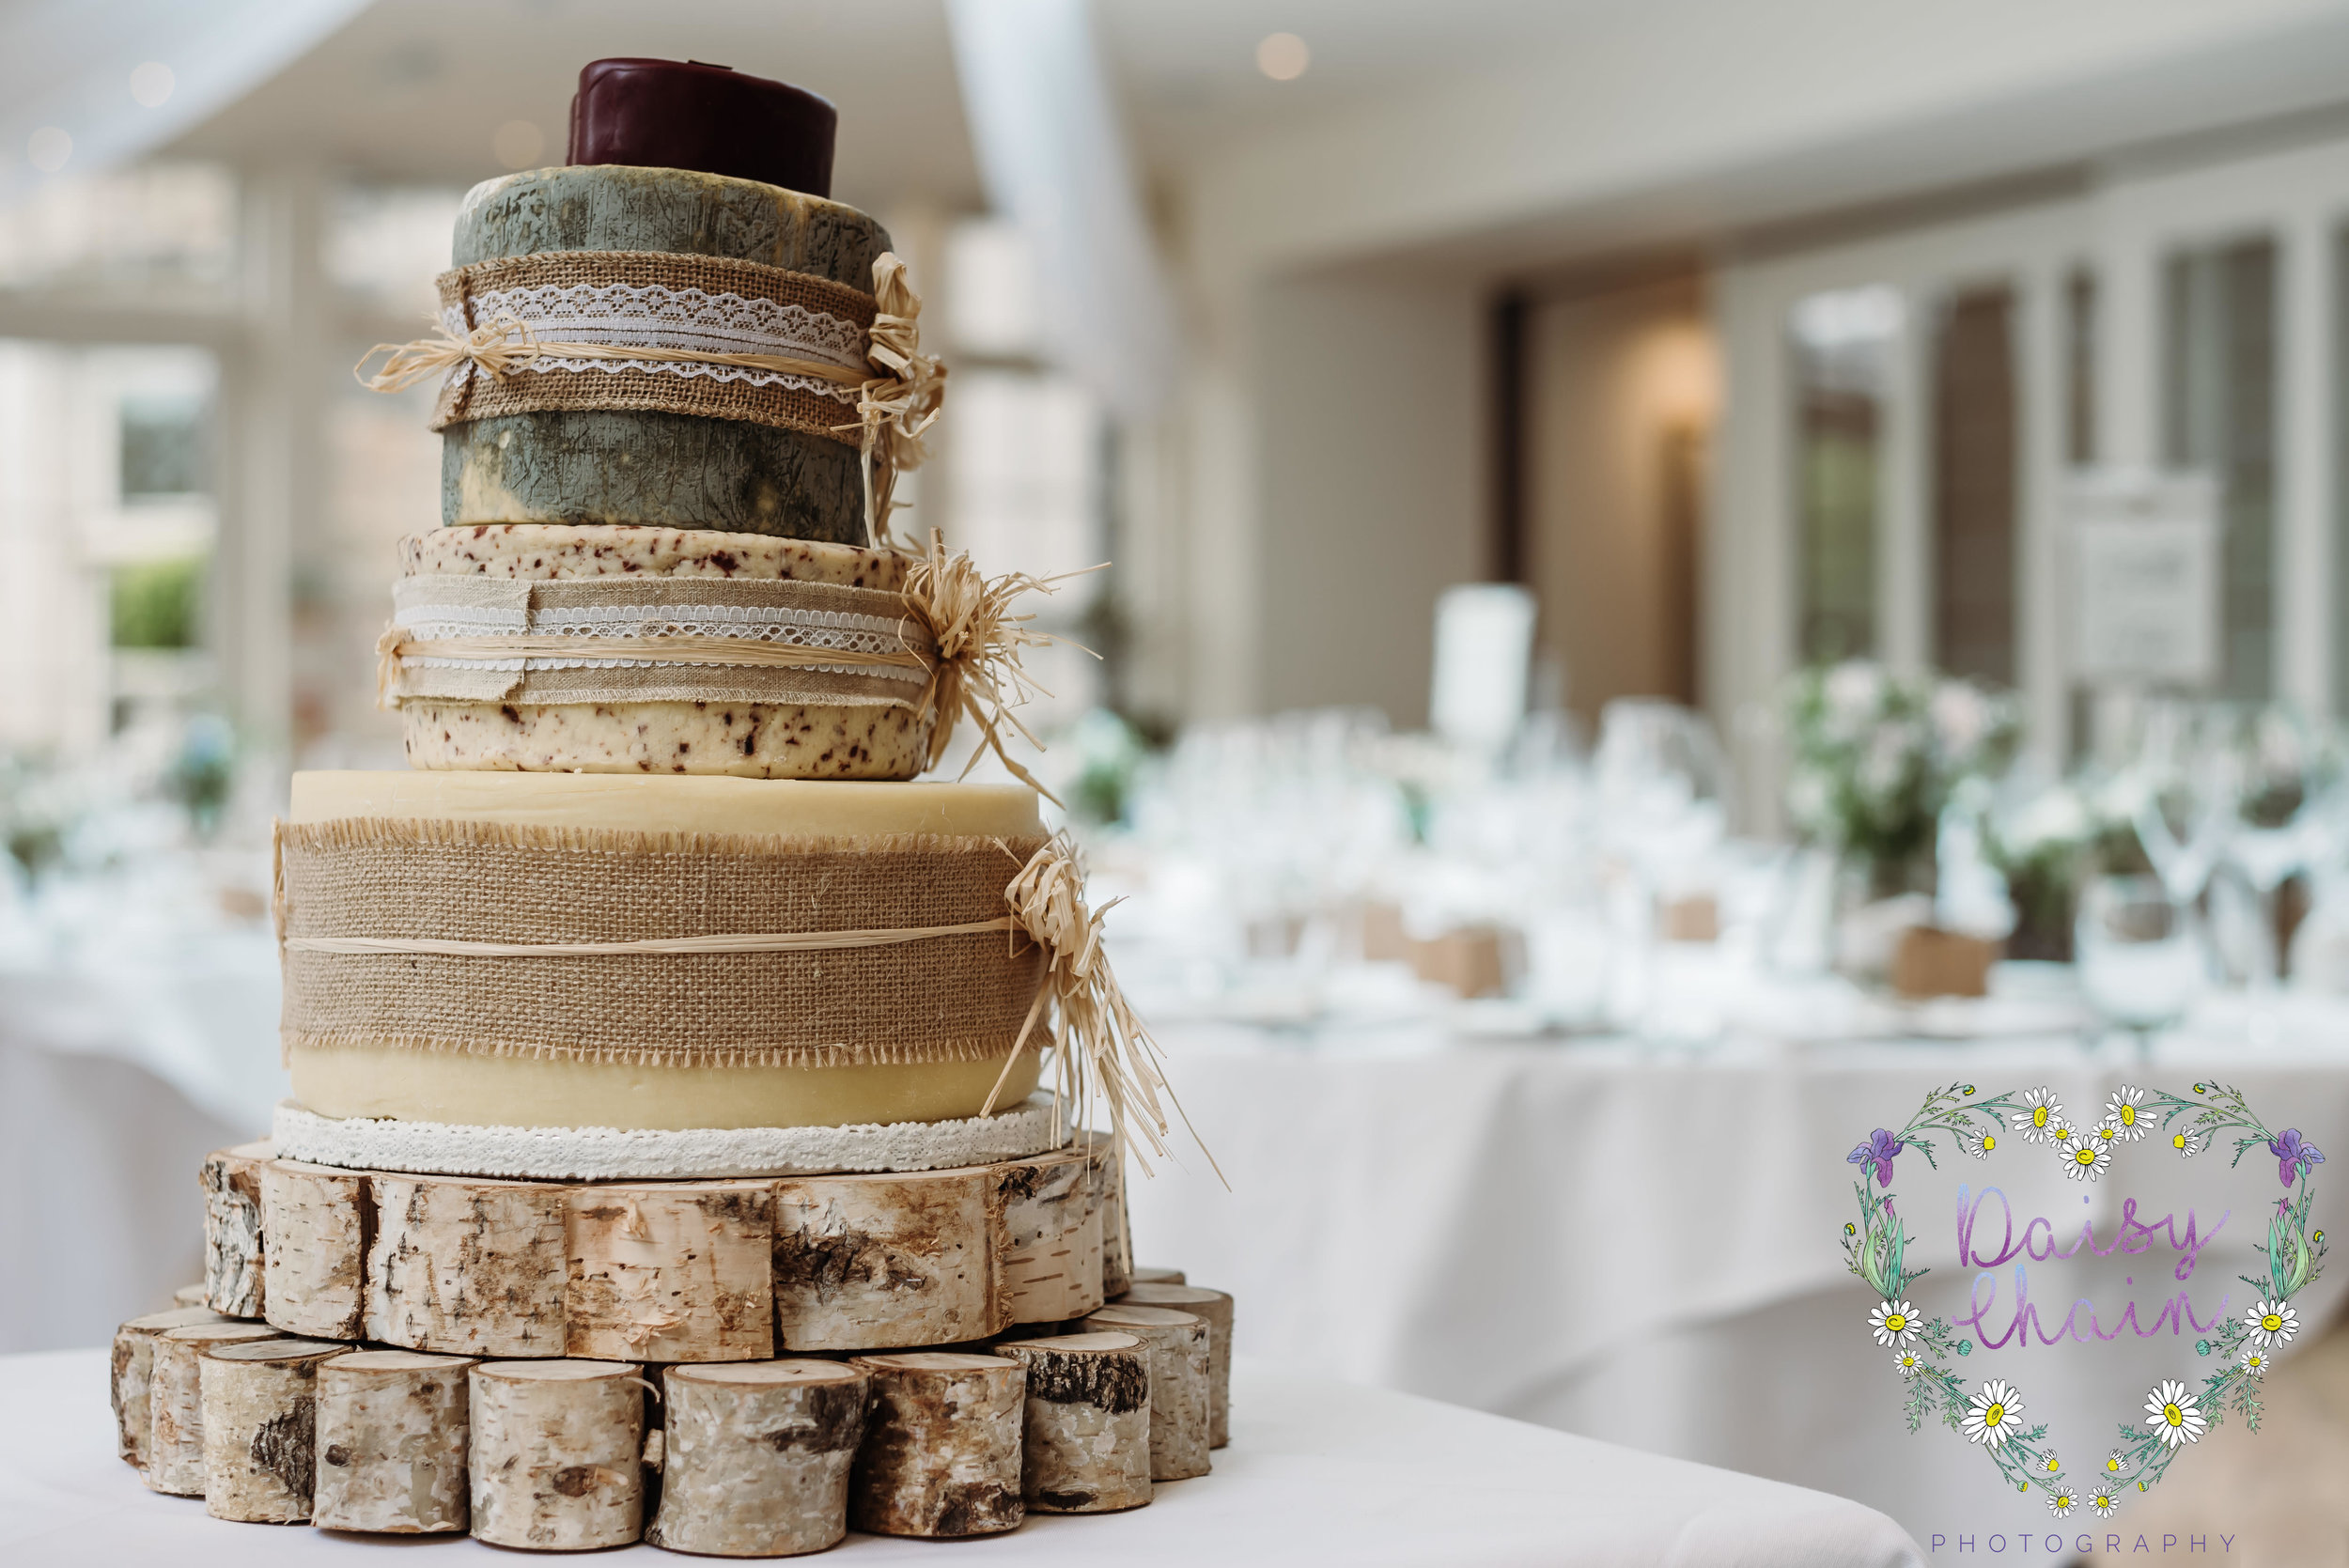 Cheese cake - wedding cake